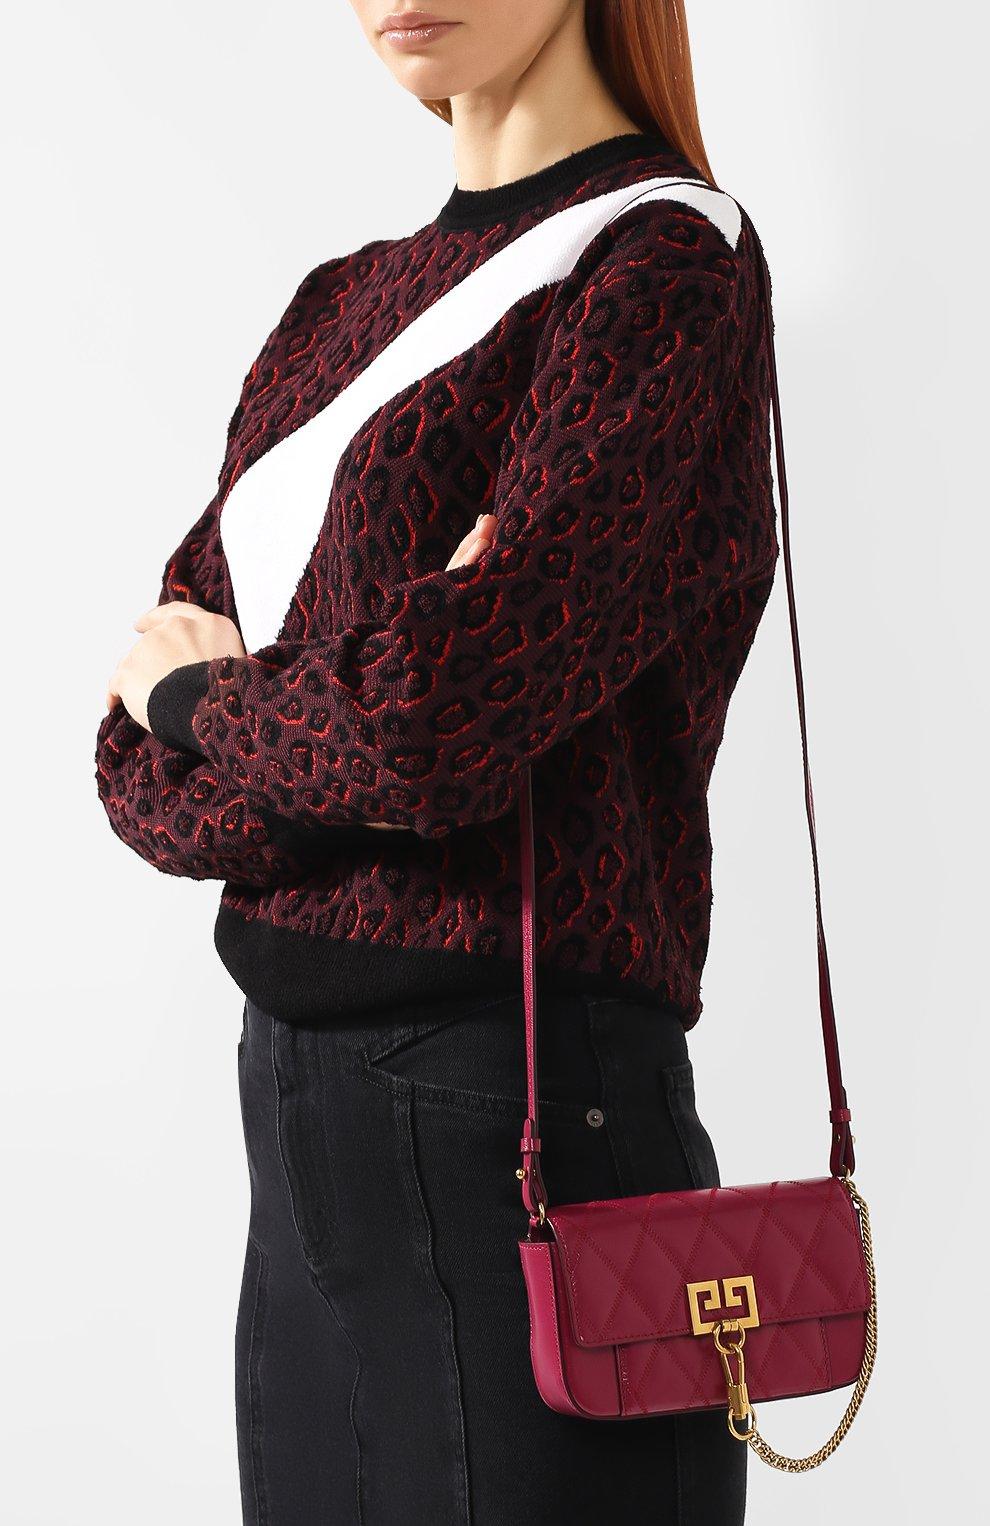 Поясная сумка Pocket Givenchy фиолетовая | Фото №5